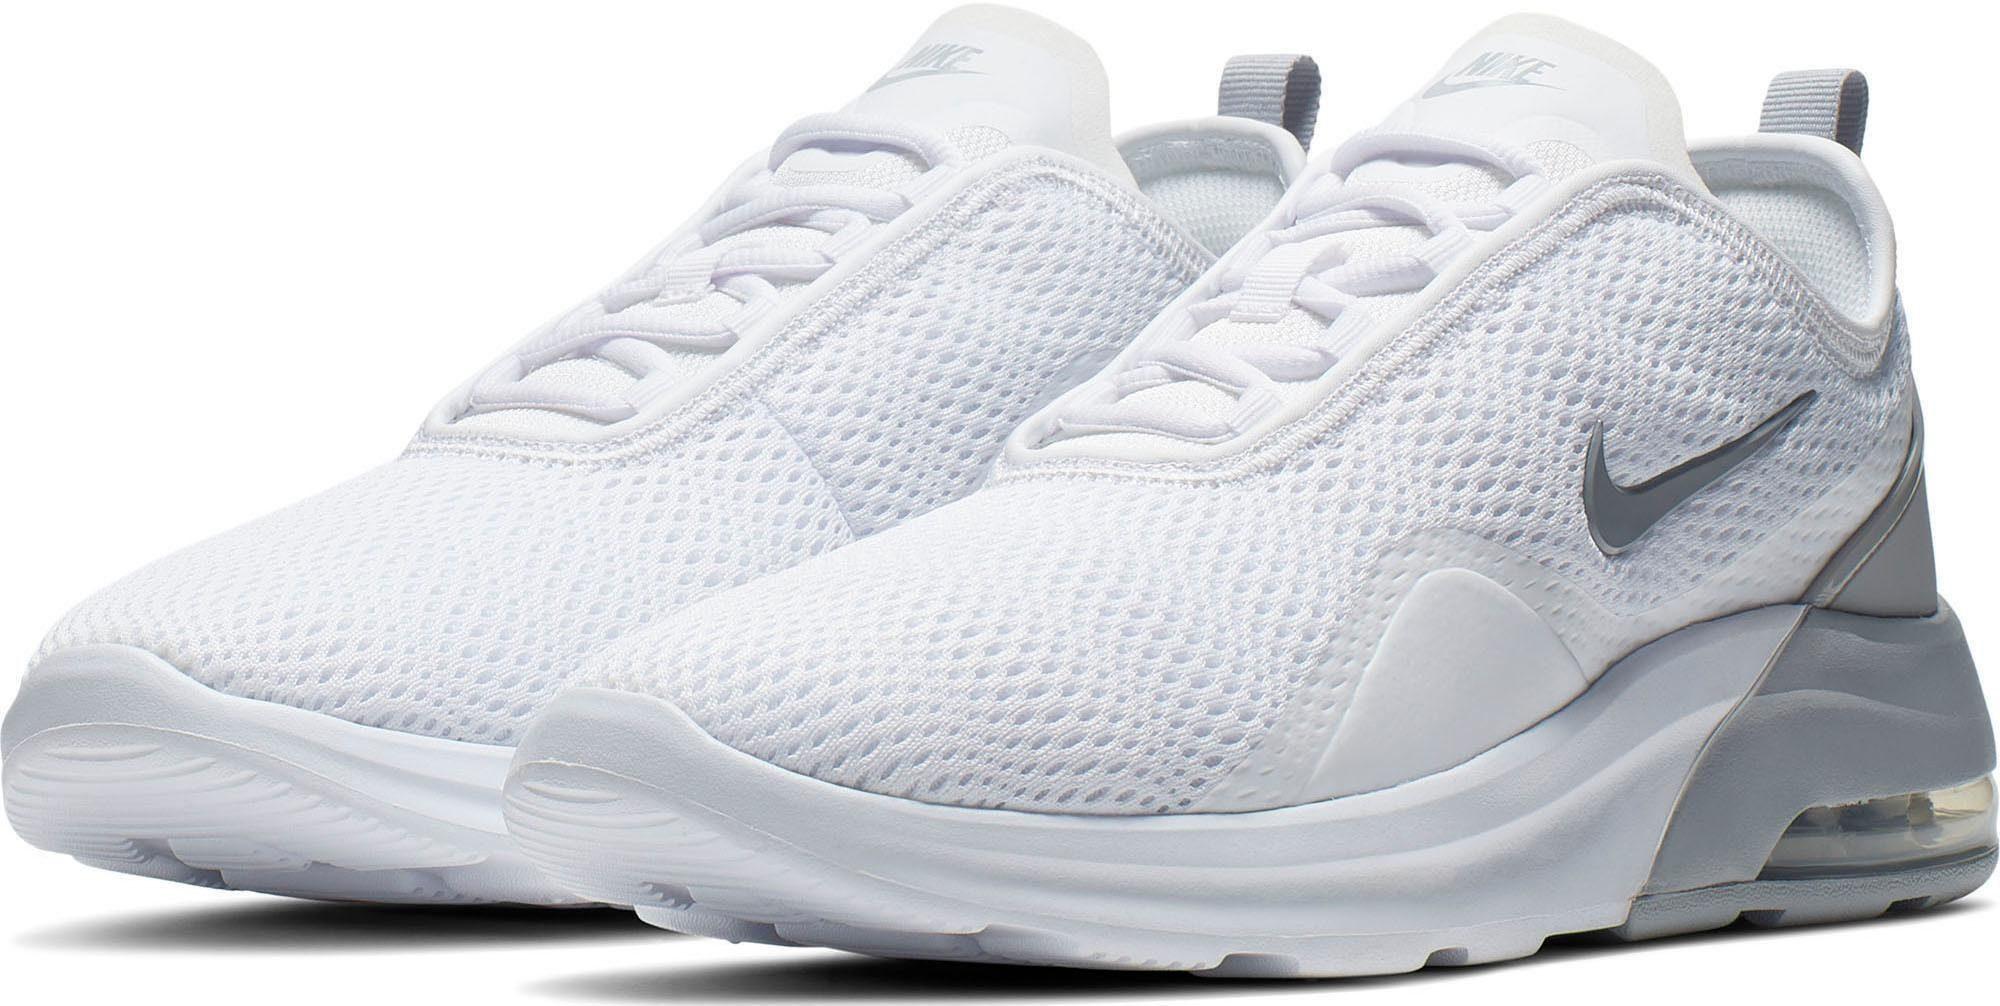 Sportswear 2« »Air Кроссовки Nike Motion Max 4LRA5j